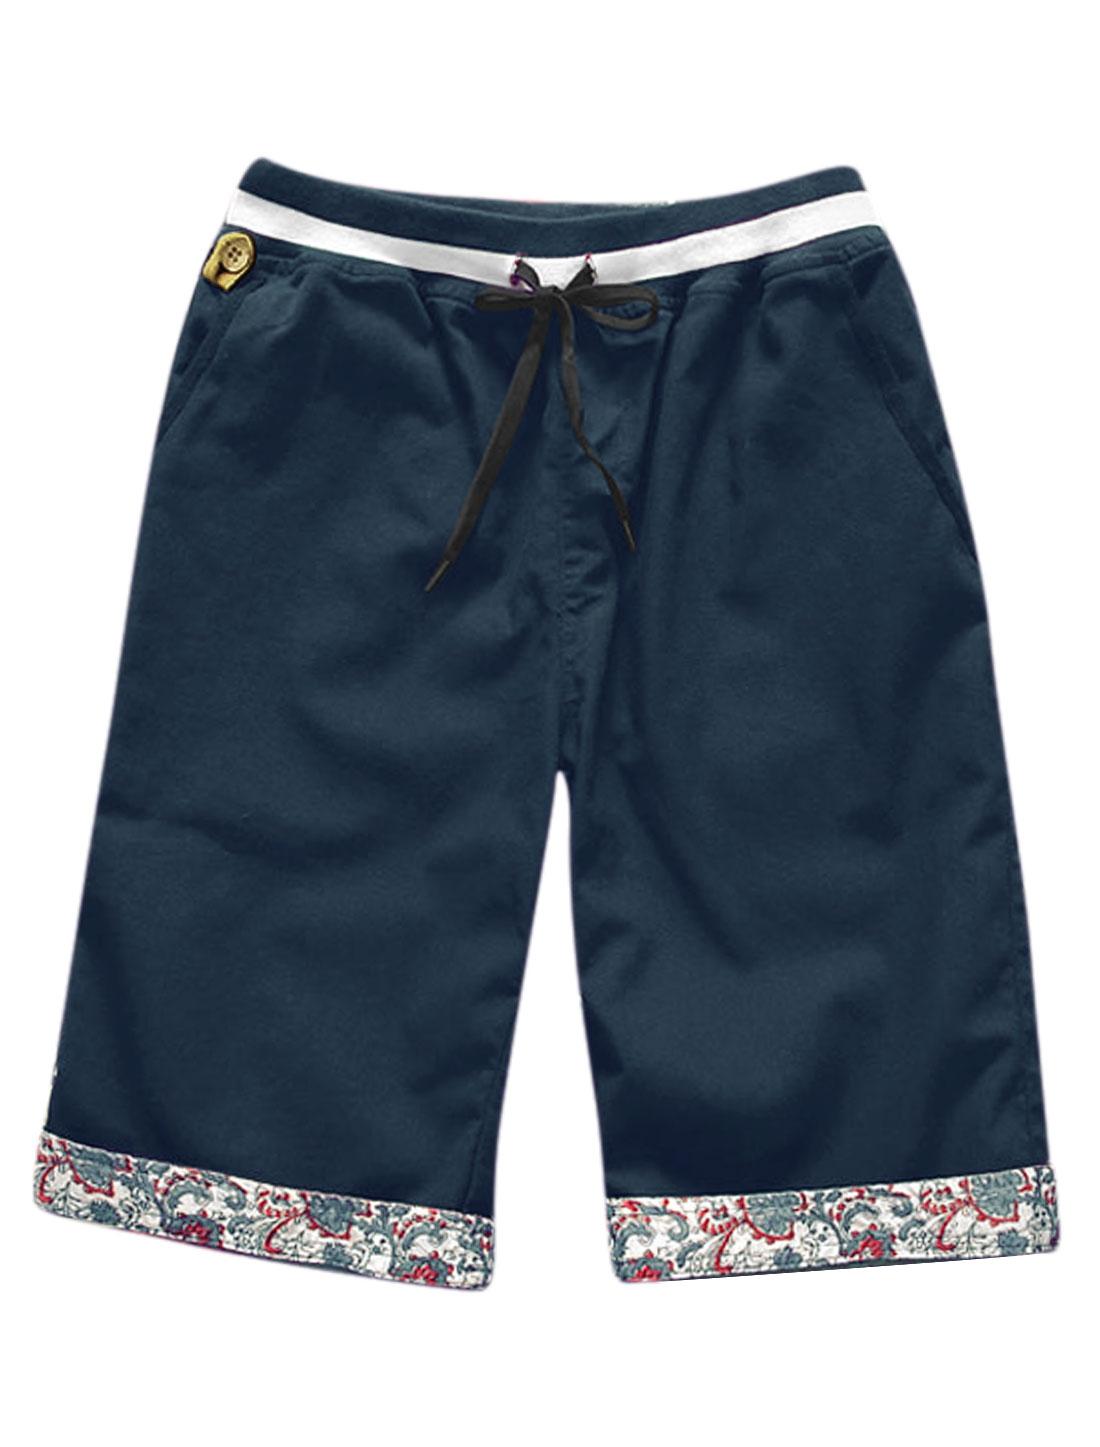 Man Ribbed Elastic Waist Band Button Decor Detail Shorts Navy Blue W34